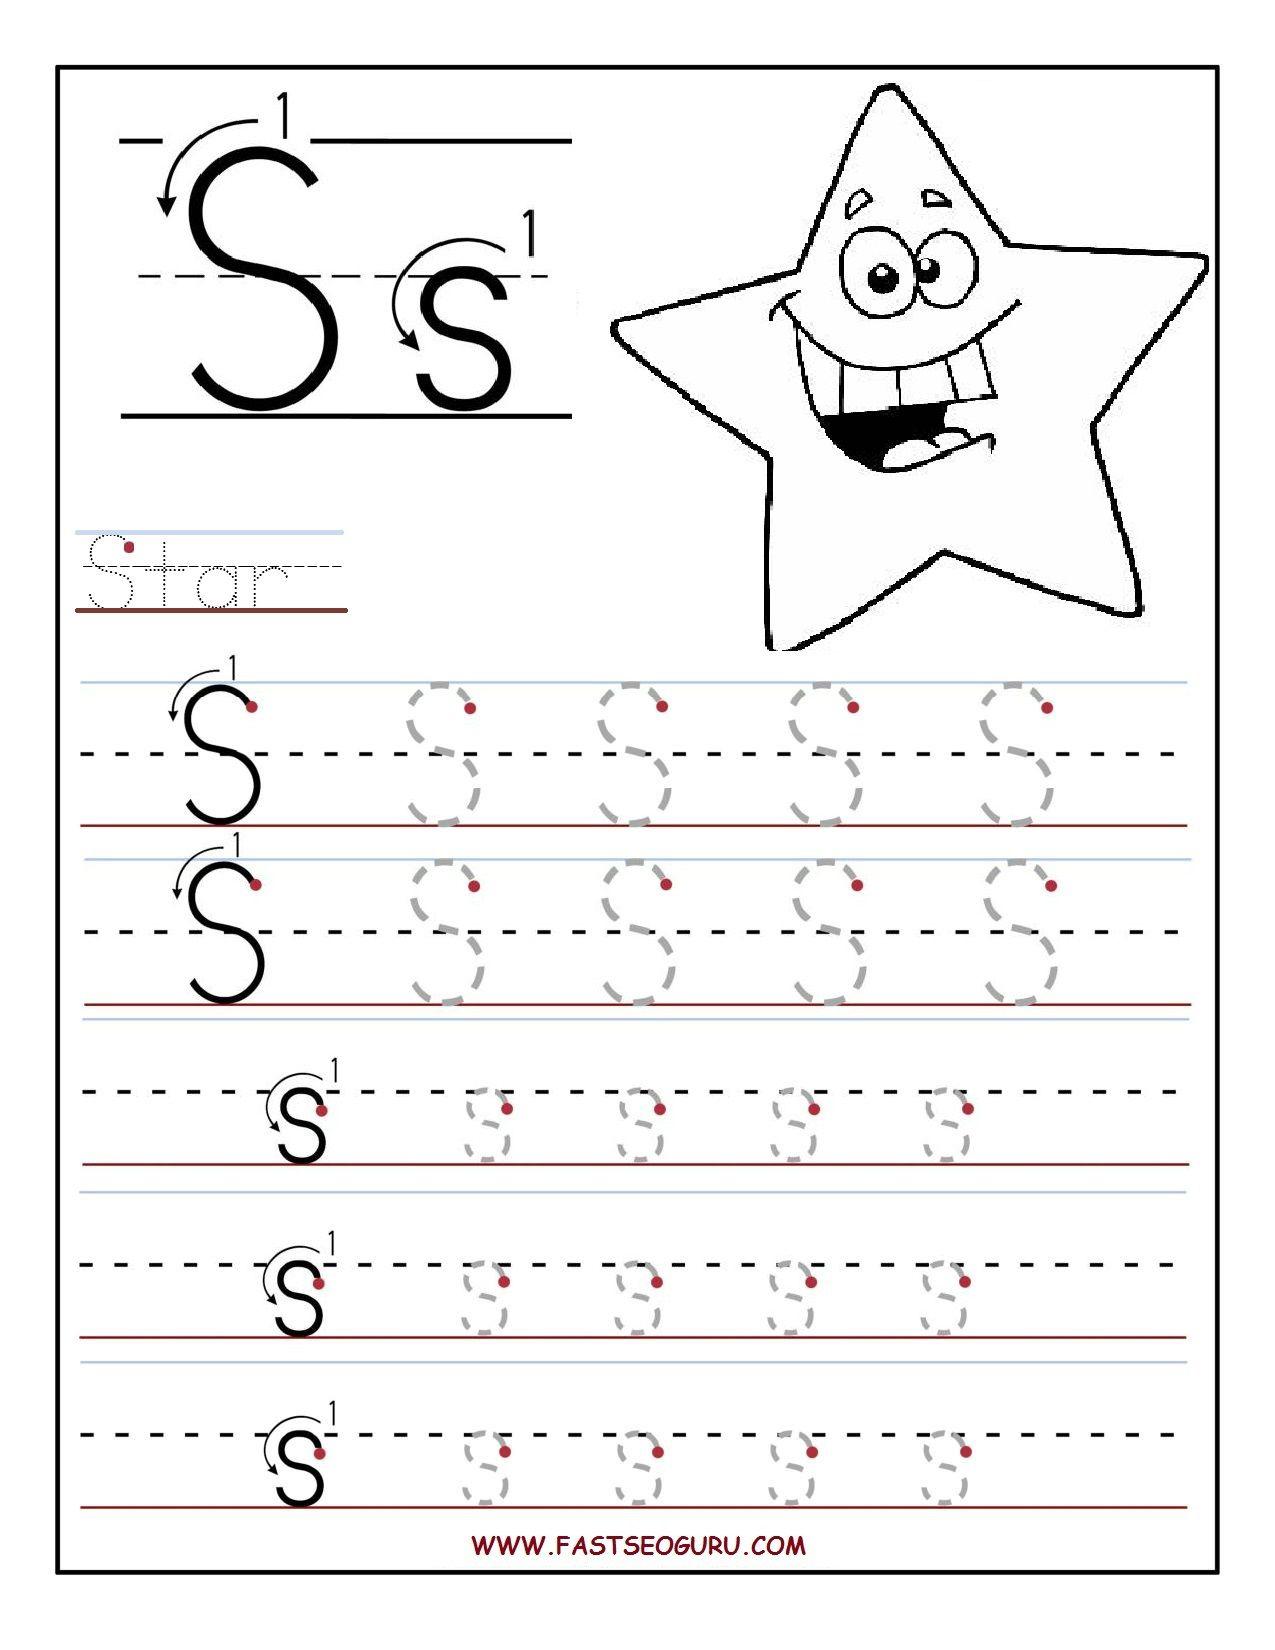 Pinkatie Mueller On Growing Place | Preschool Worksheets inside Letter S Worksheets